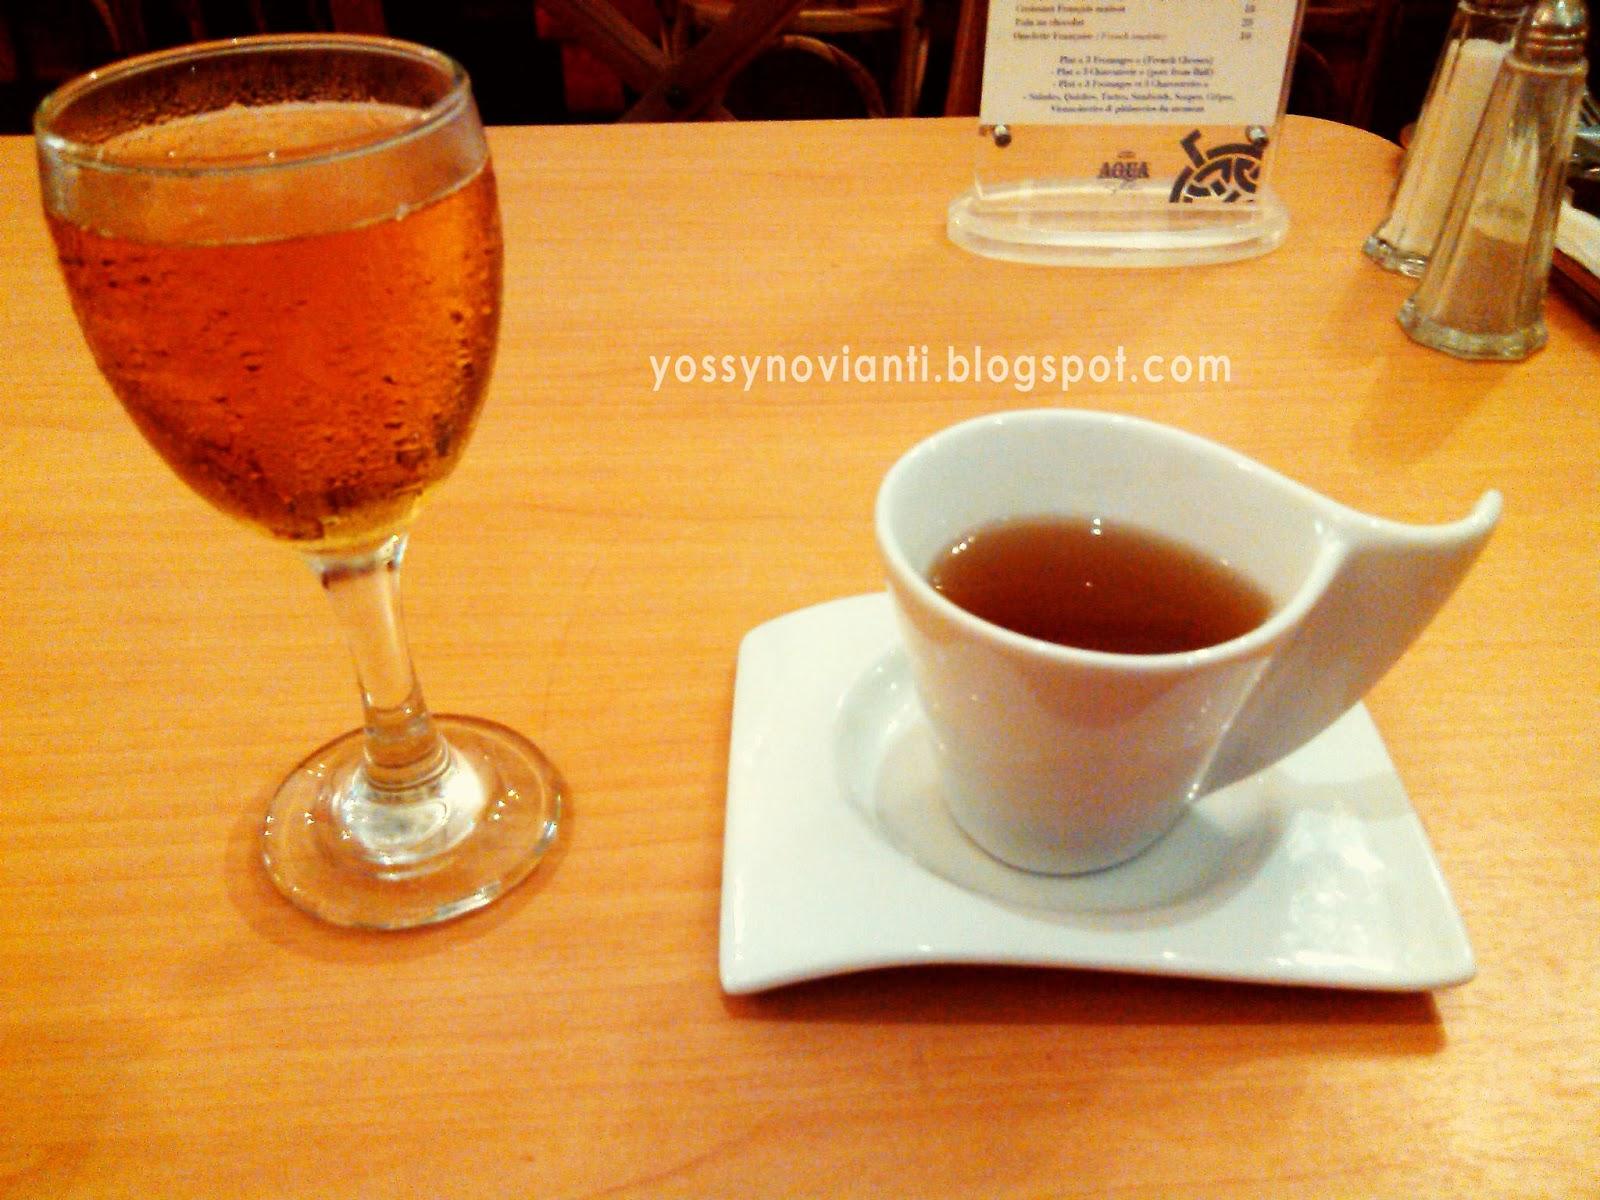 beautiful mind of yossy: Paris Villages - Restaurant Review